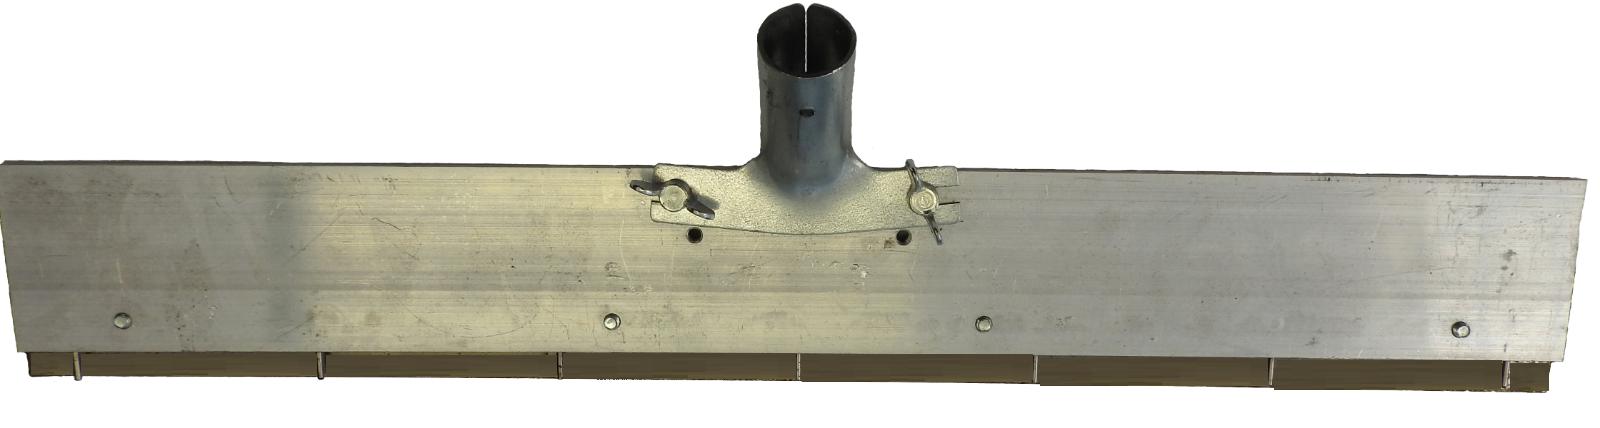 Floor Epoxy Latex Screed Self Levelling Pin Rake Pin Leveller Tool